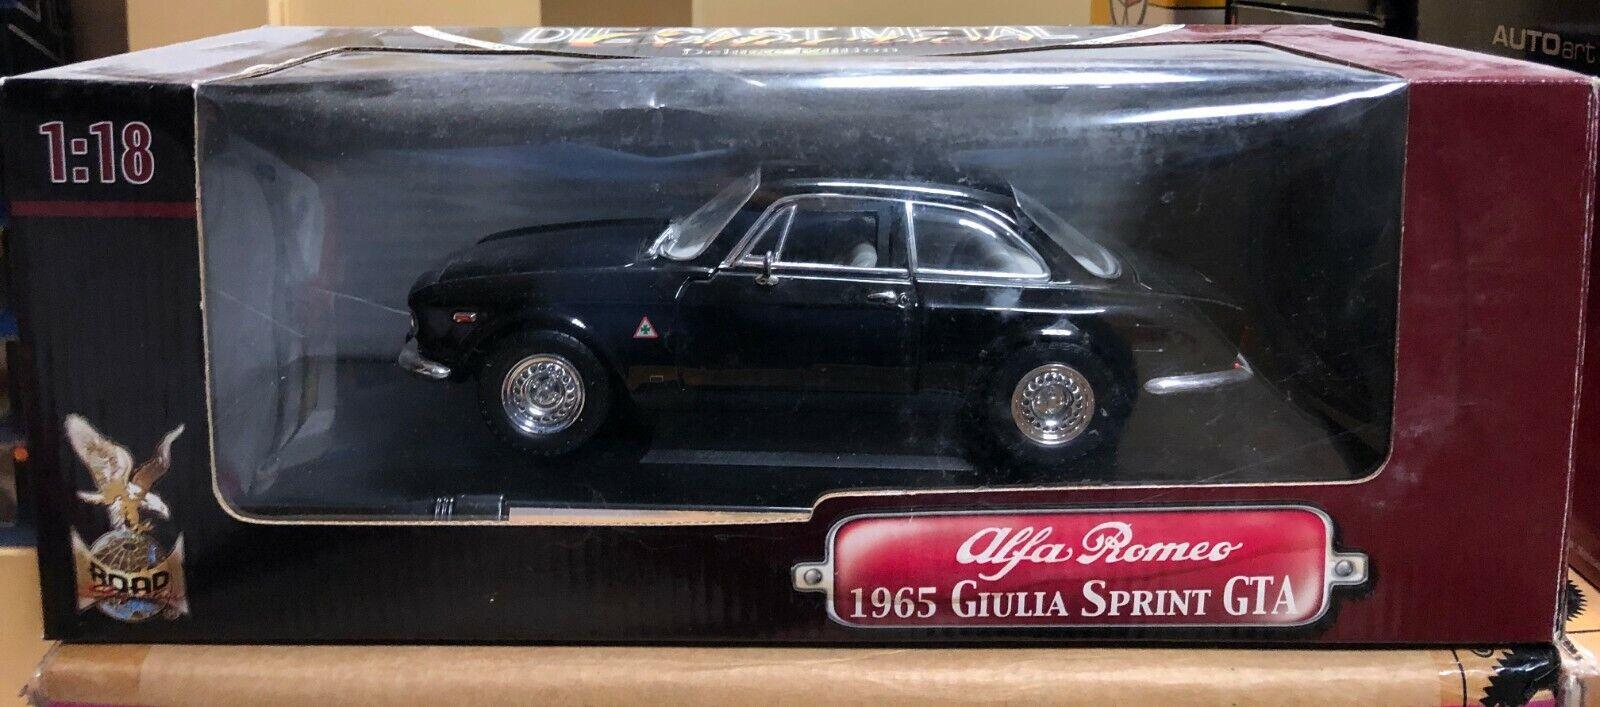 1965 ALFA ROMEO GIULIA SPRINT GTA Coupé Noir 1 18 par Yat Ming NEUF en Boîte Ancienne